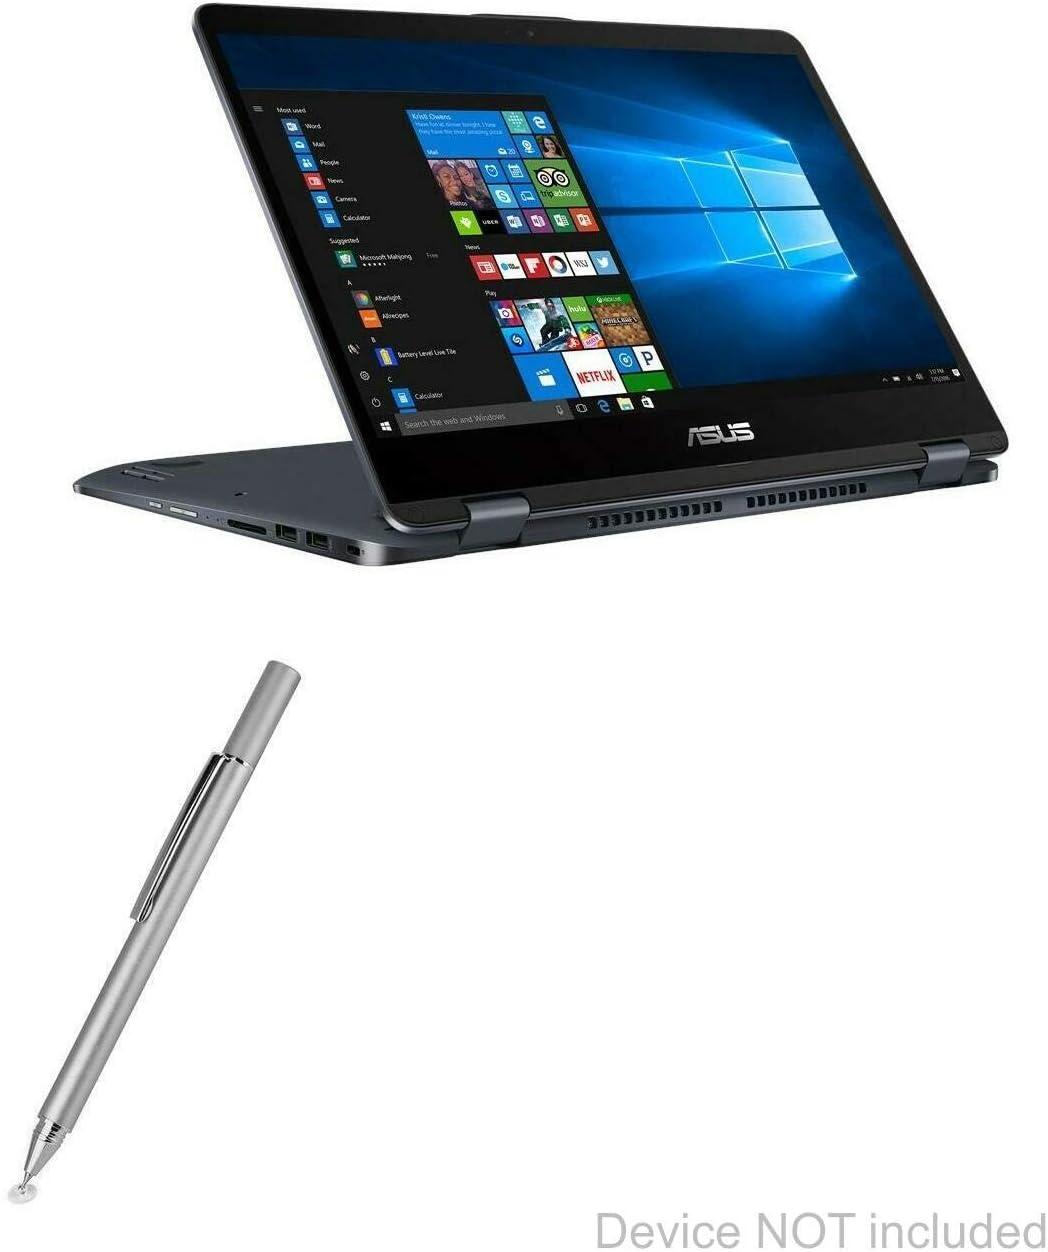 Broonel Black Mini Fine Point Digital Active Stylus Pen Compatible with The ASUS VivoBook S14 S410UA ASUS VivoBook S14 S430FA